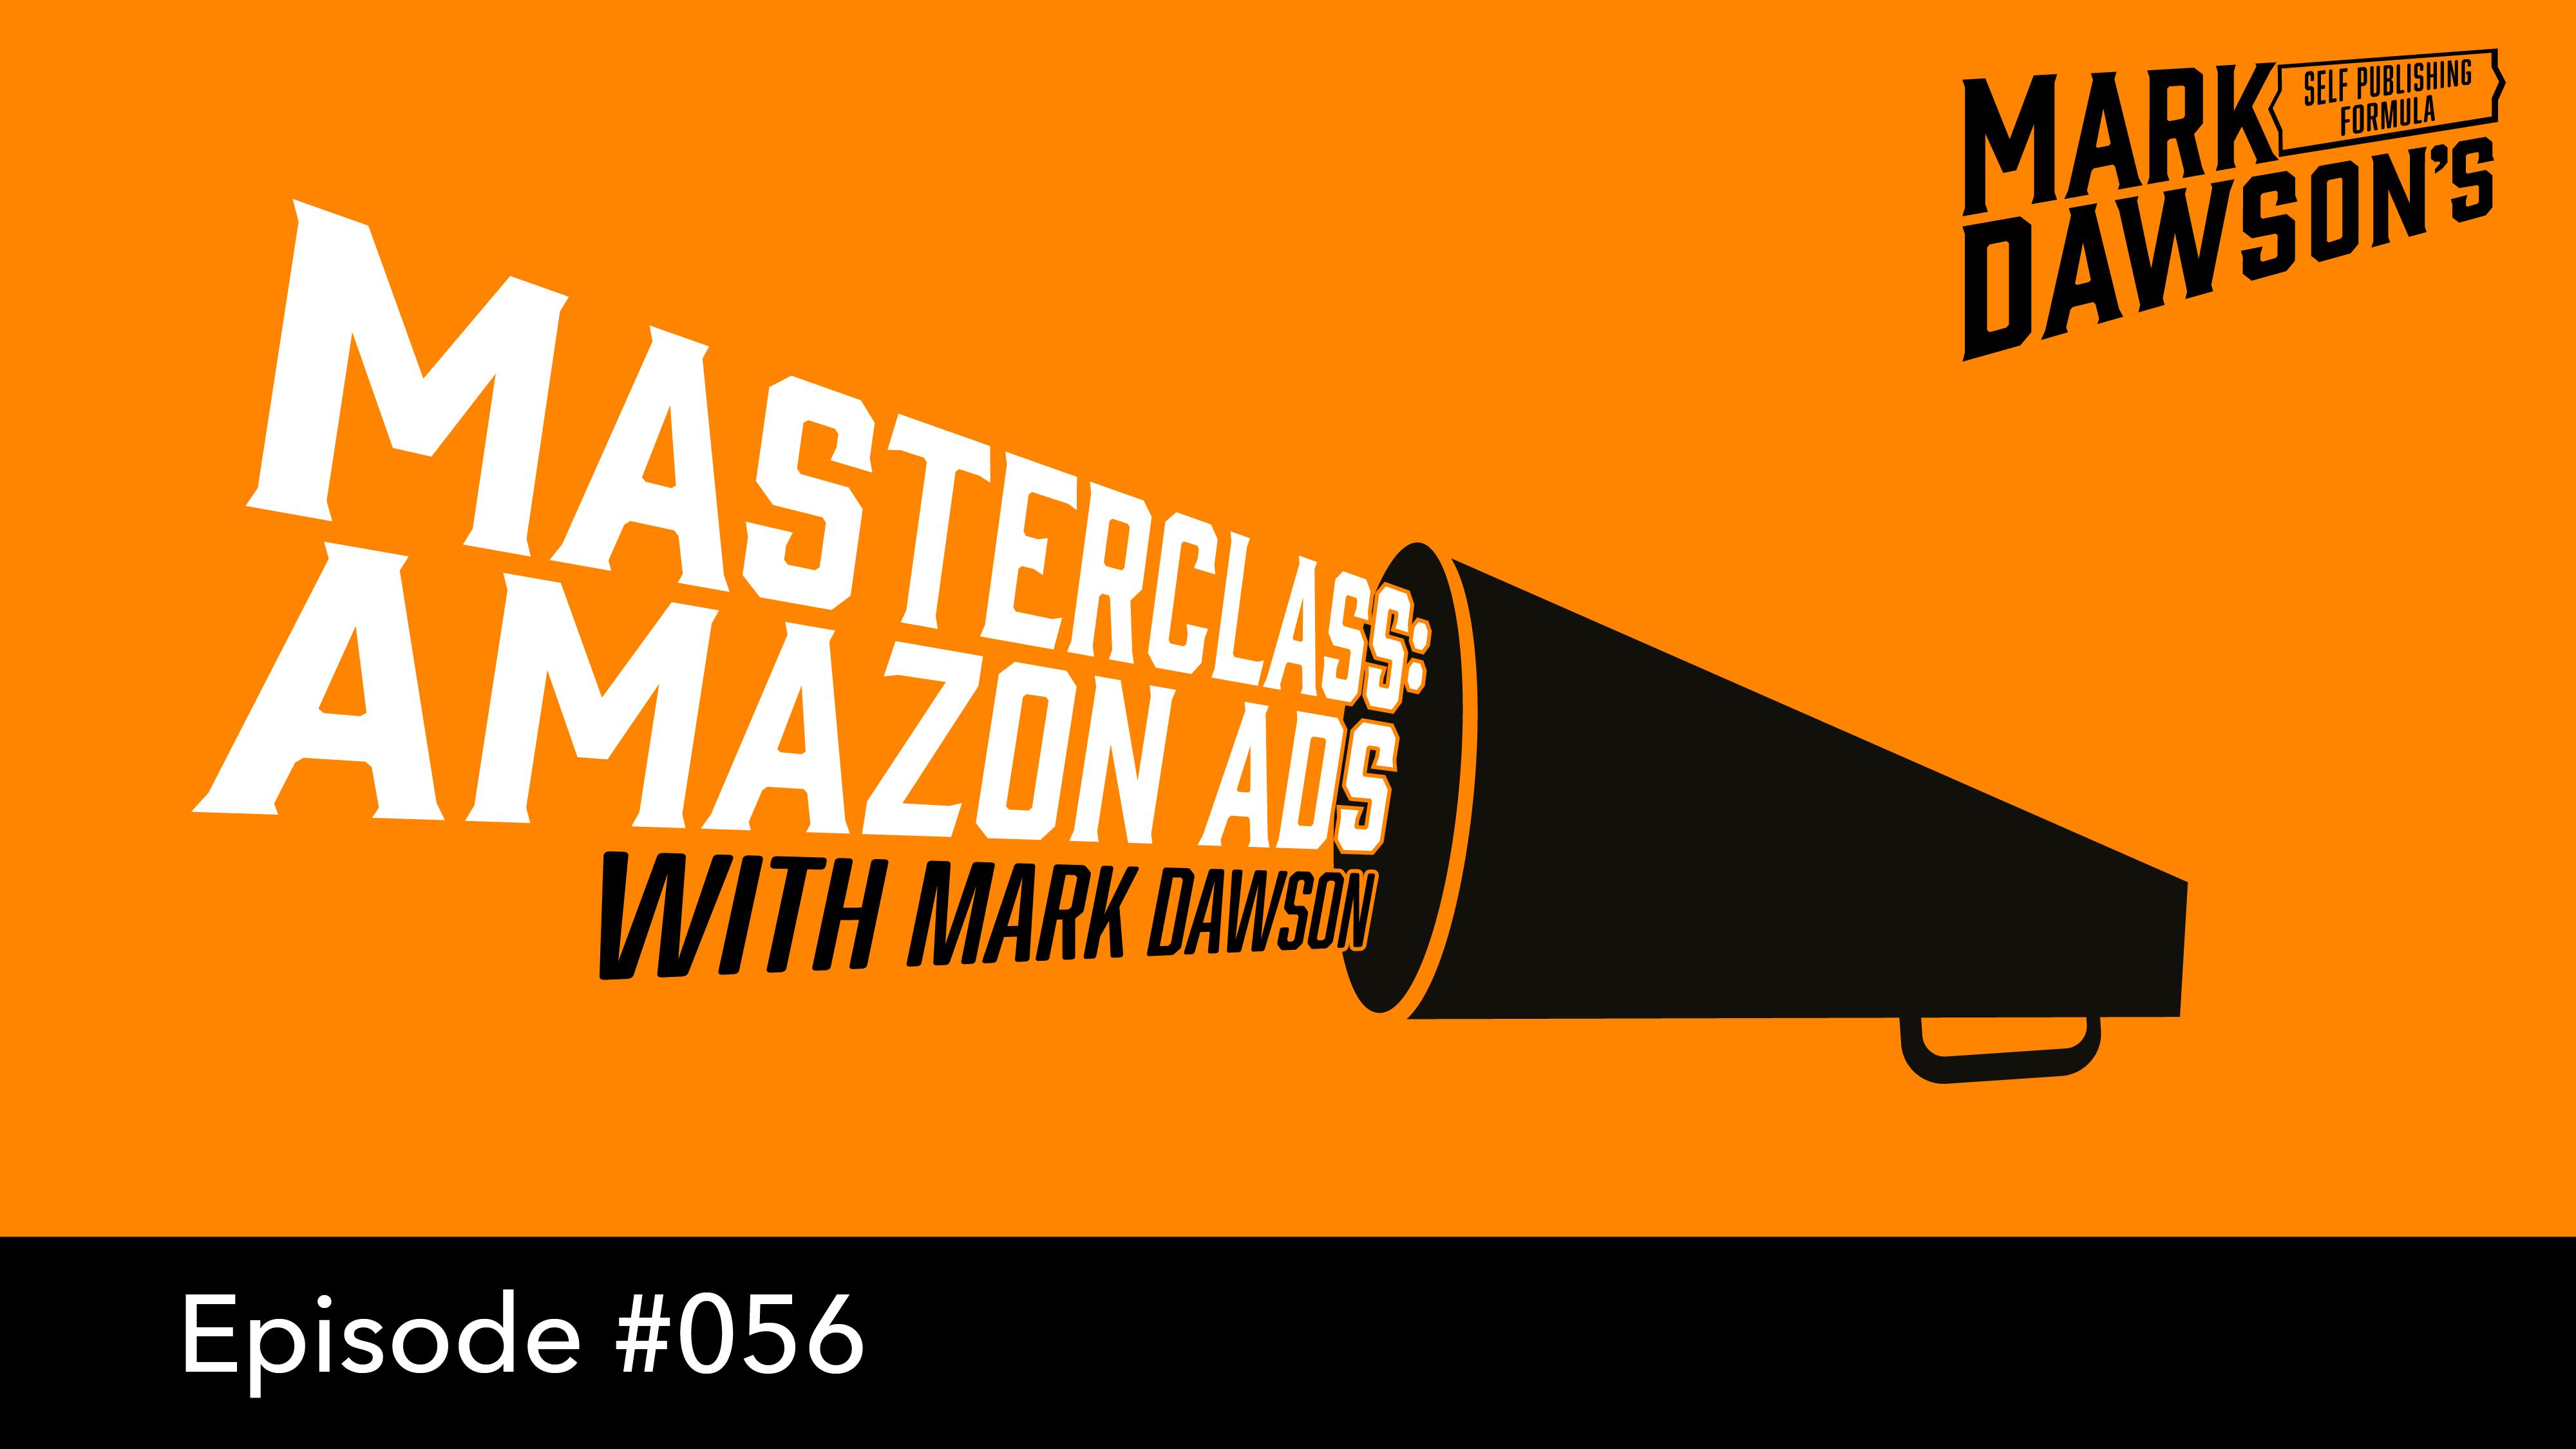 Masterclass: Mastering Amazon Ads with Mark Dawson.